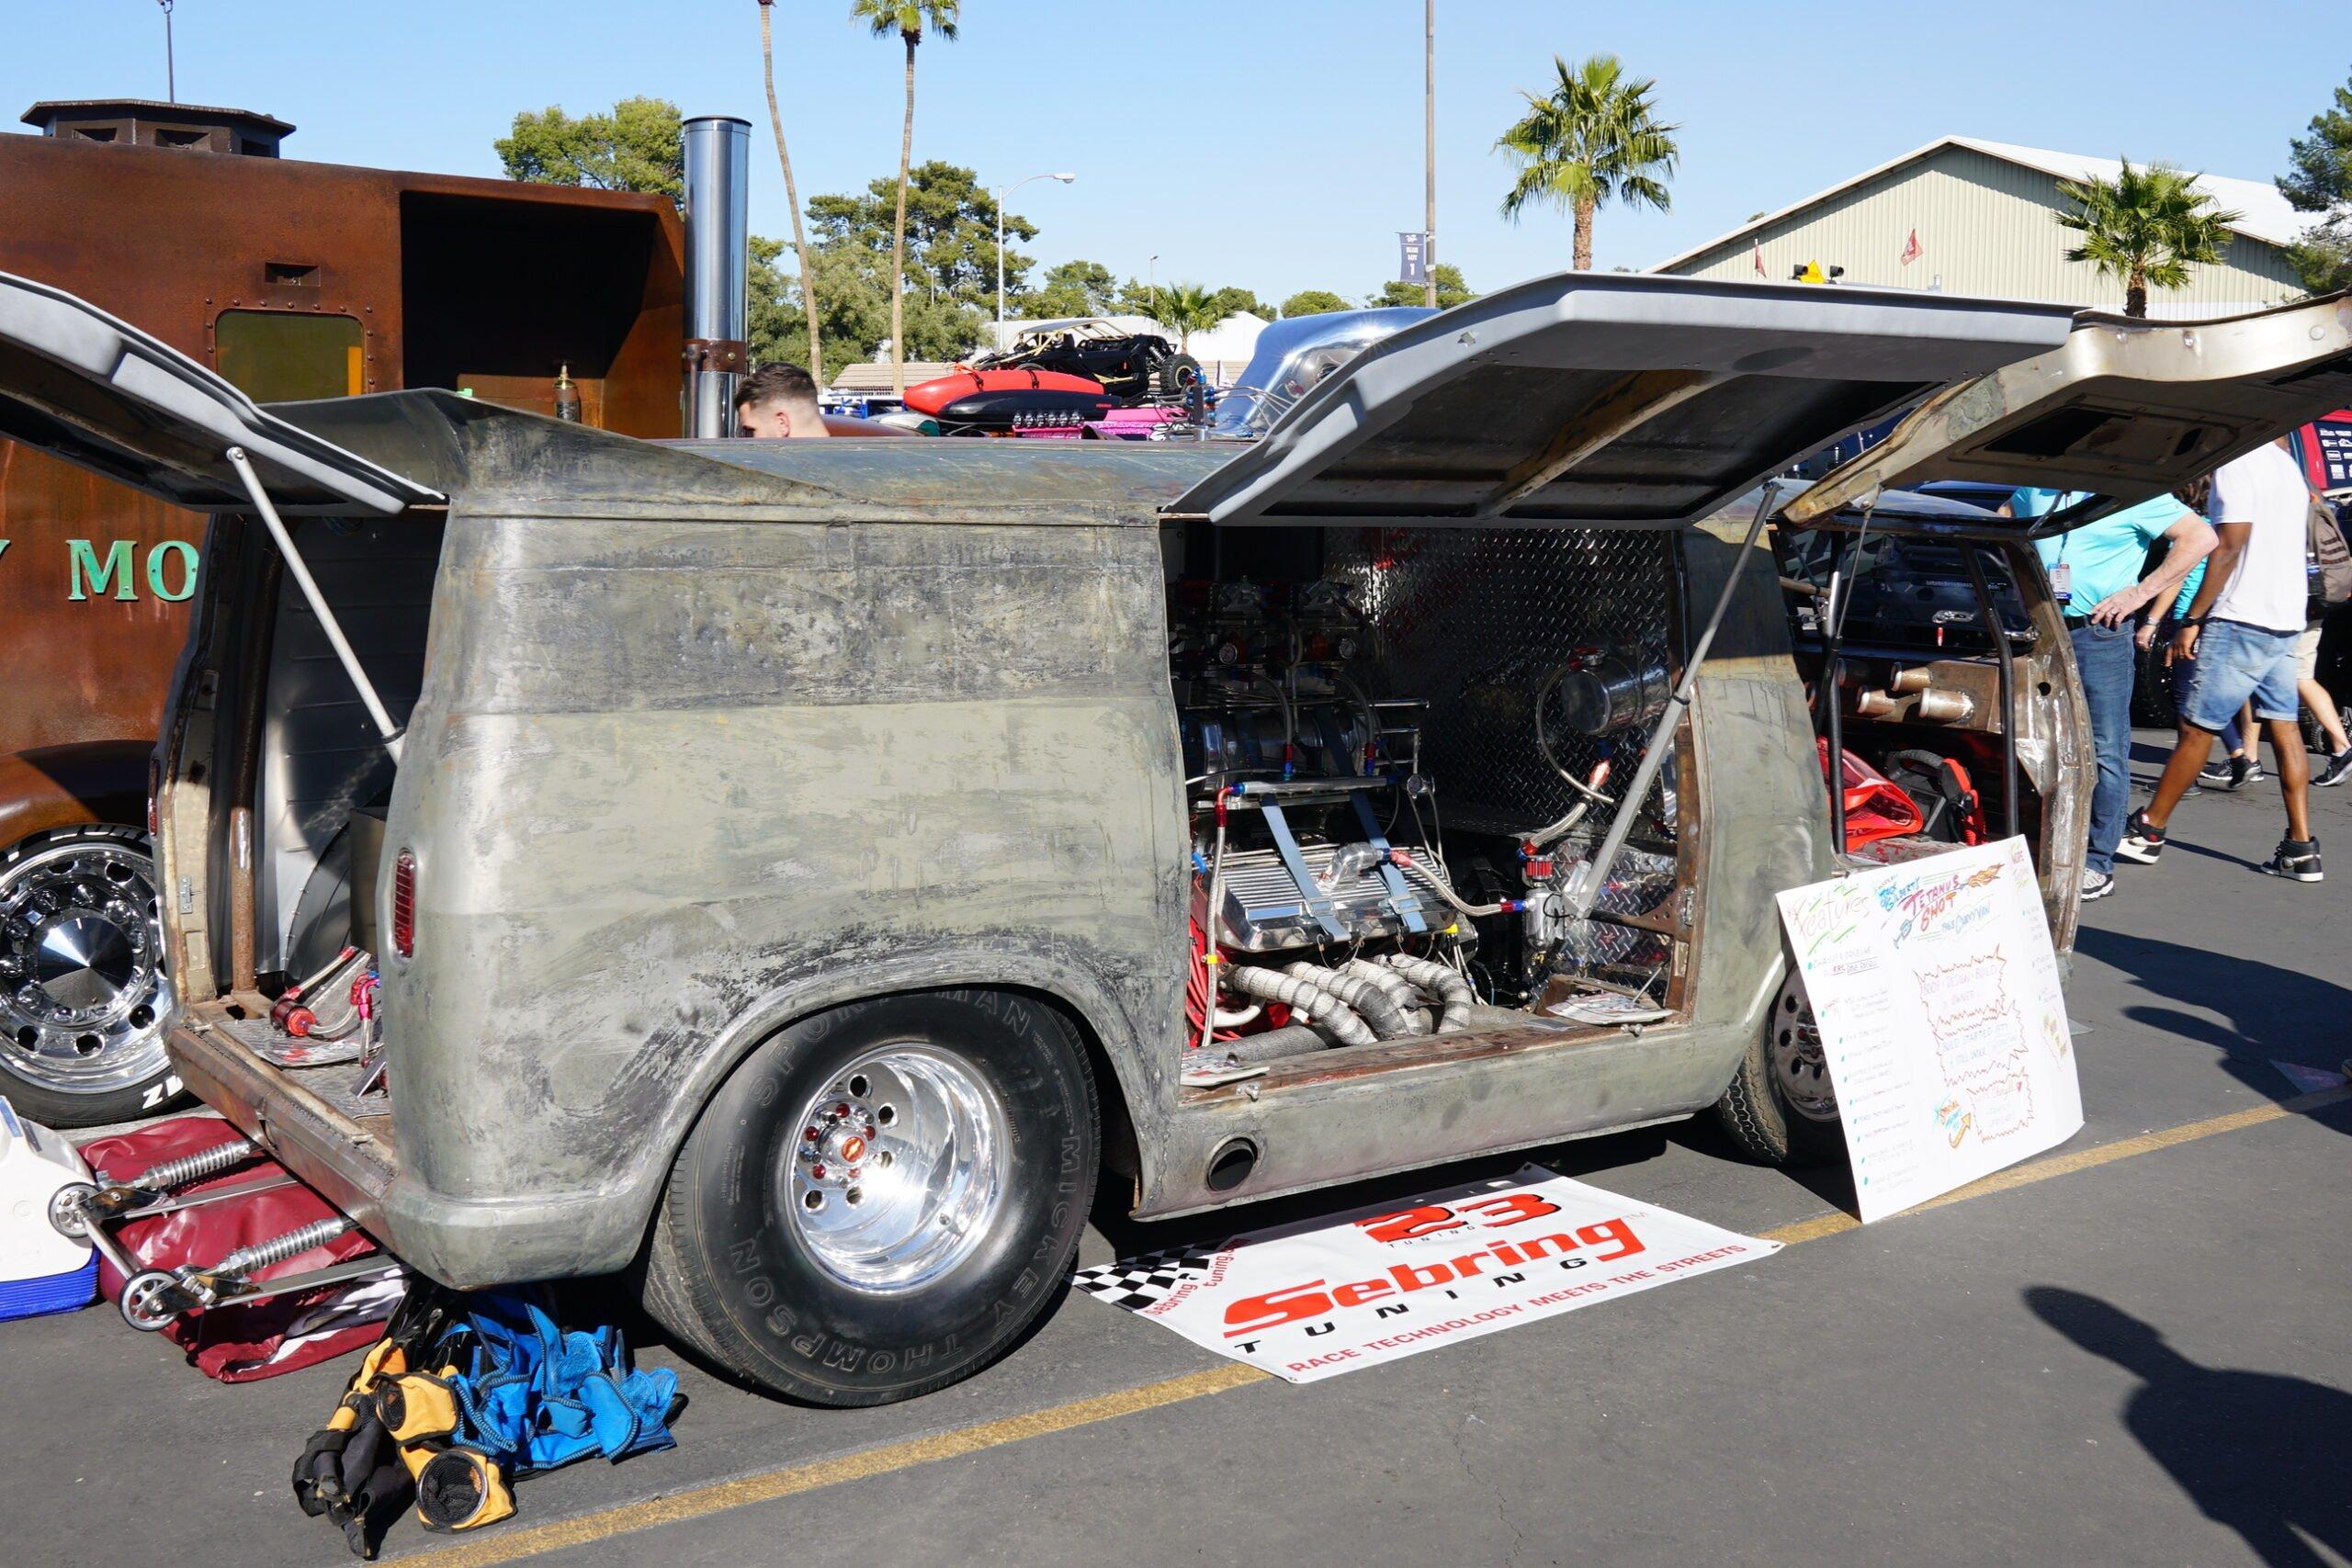 JACK GILBERT JR.'S CHEVY VAN at auto show